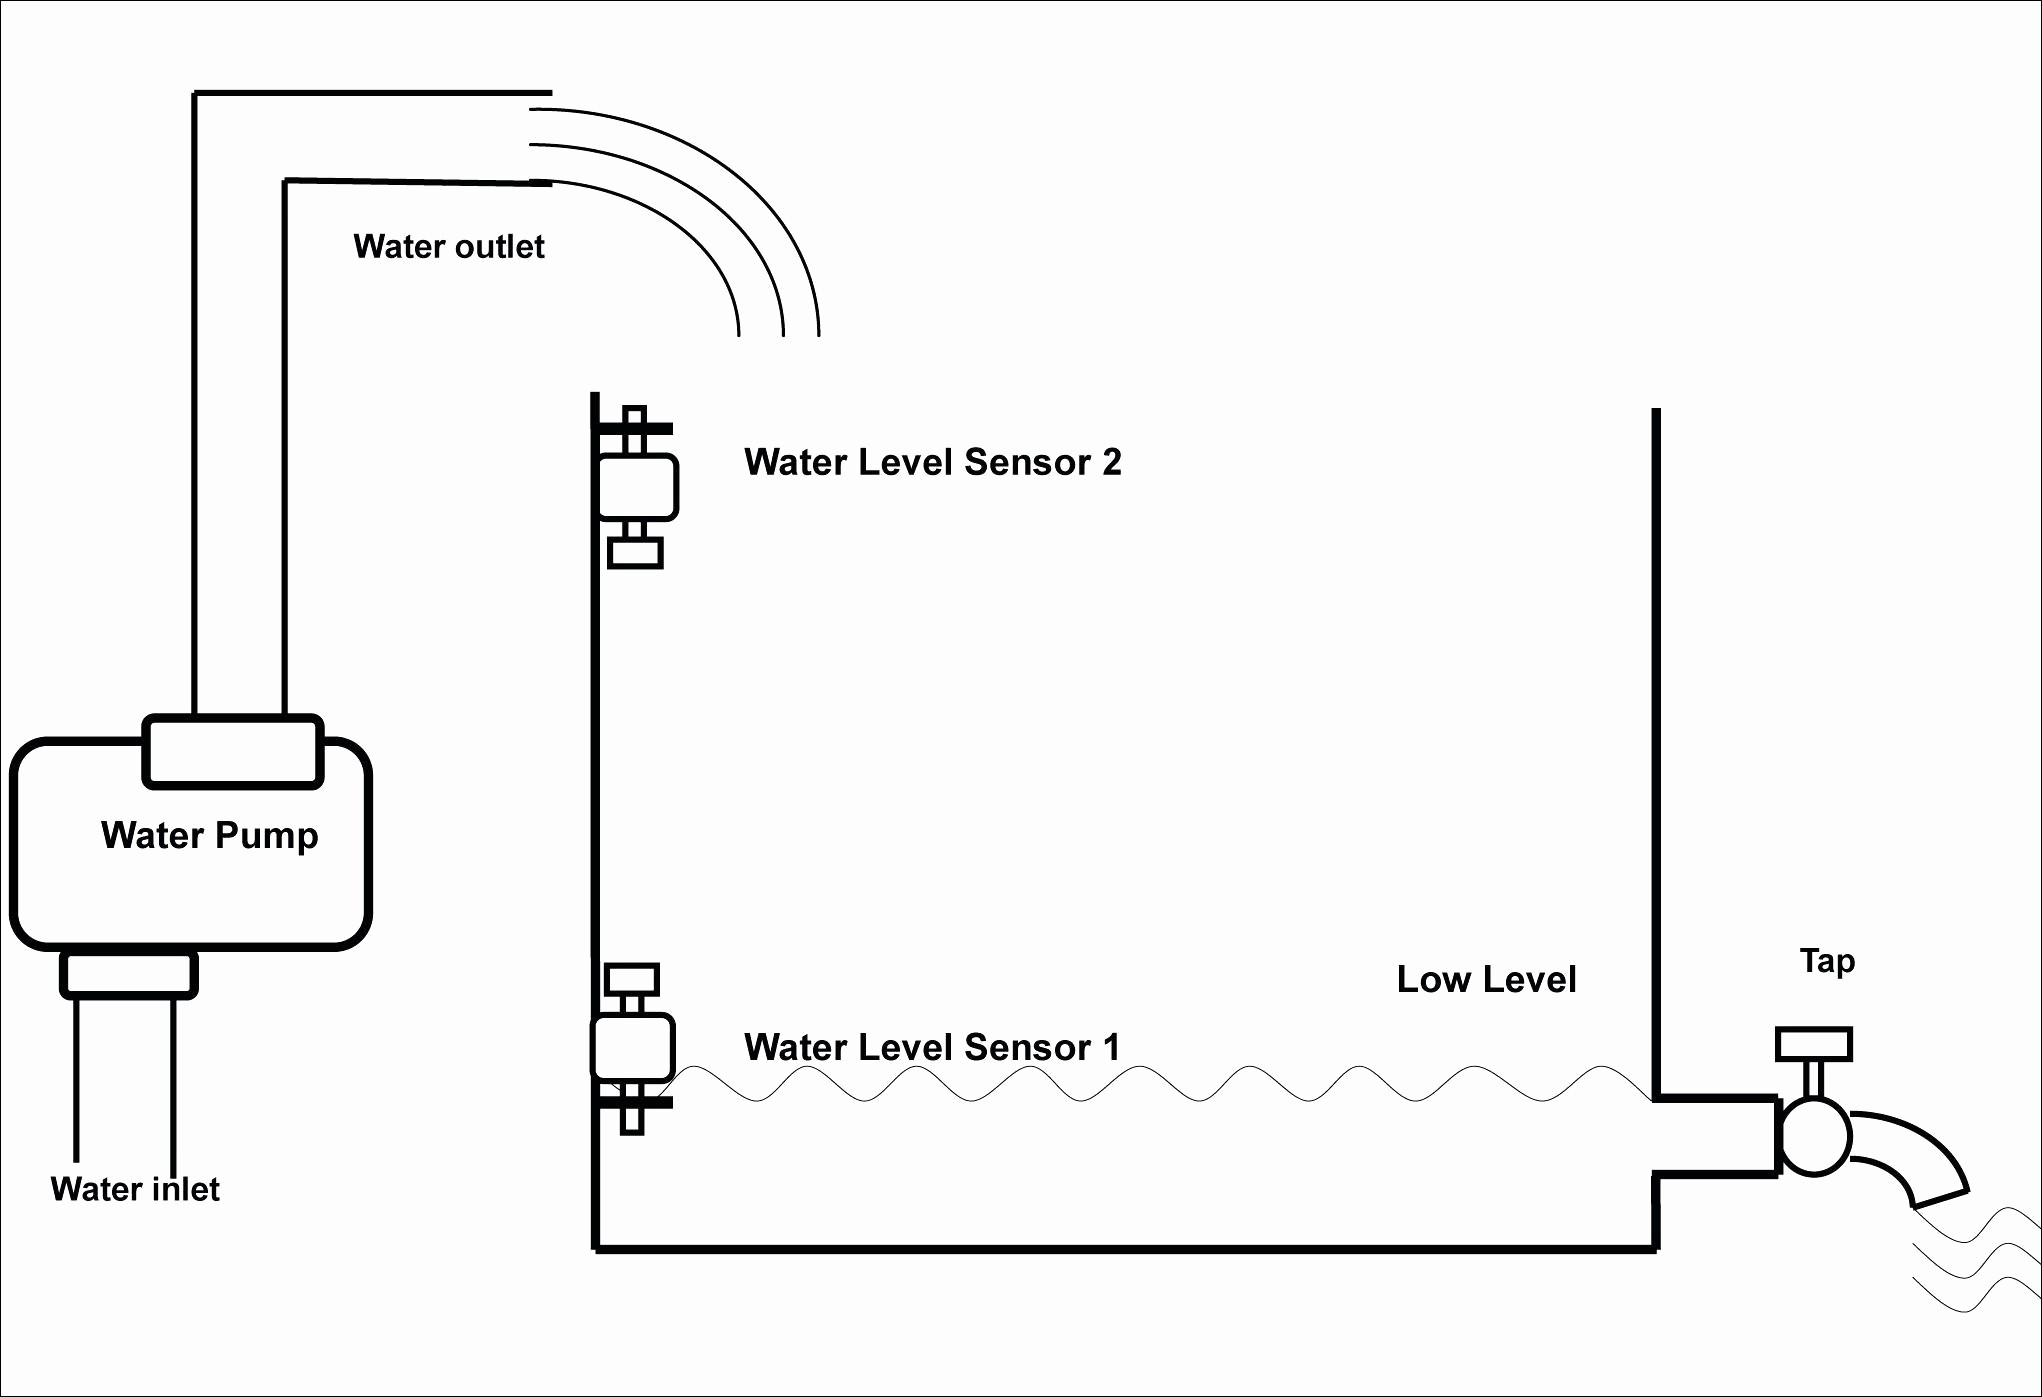 Badland Winch Wiring Diagram Inspirational Unique Badland Wireless Remote Wiring Diagram Mold Electrical